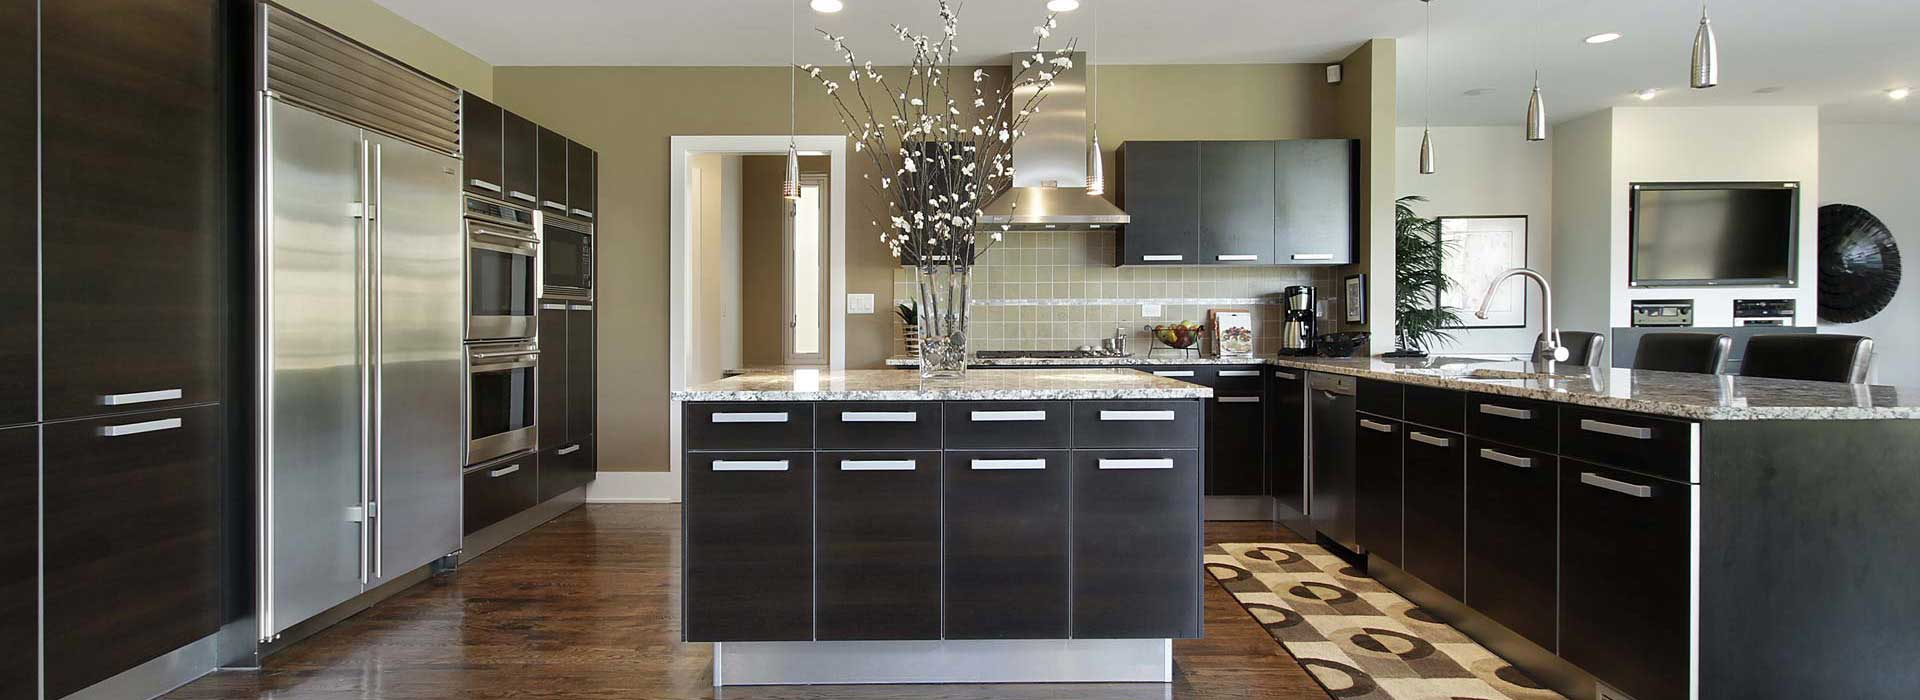 New look kitchen cabinet refacing for Cuisine allemande